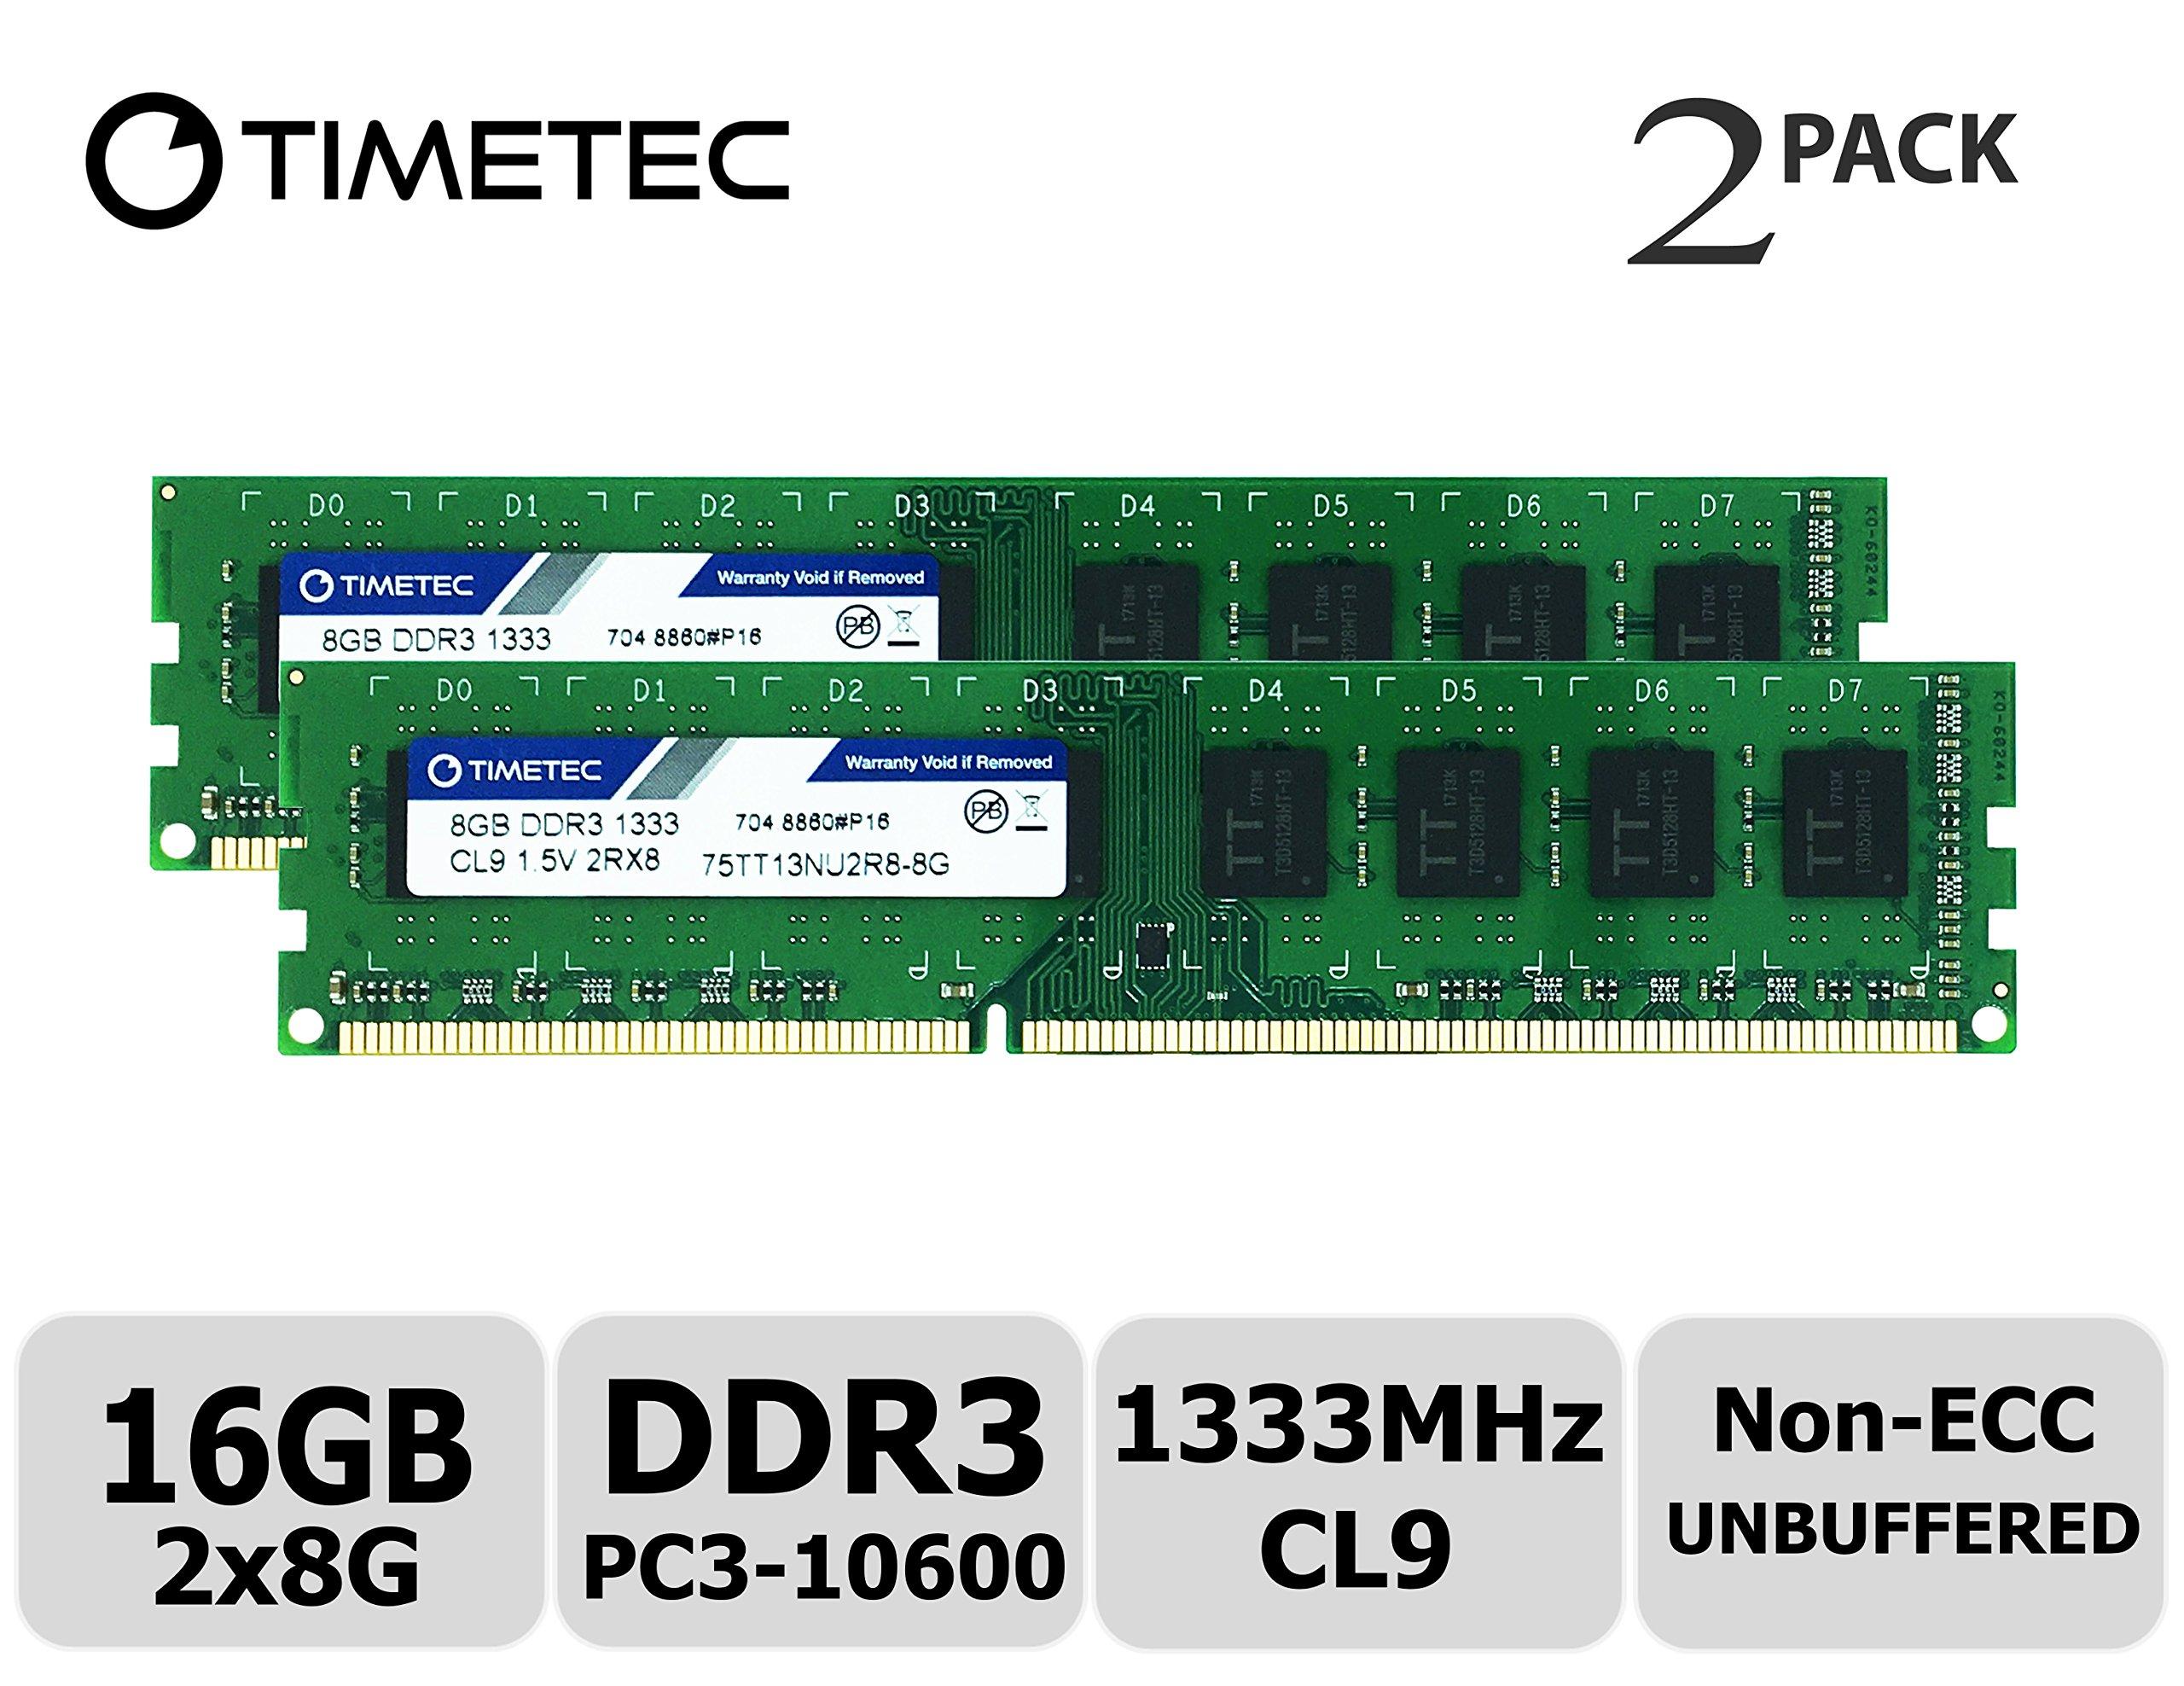 Timetec Hynix IC 16GB Kit (2x8GB) DDR3 1333MHz PC3-10600 Unbuffered Non-ECC 1.5V CL9 2Rx8 Dual Rank 240 Pin UDIMM Desktop Memory Ram Module Upgrade (16GB Kit (2x8GB))